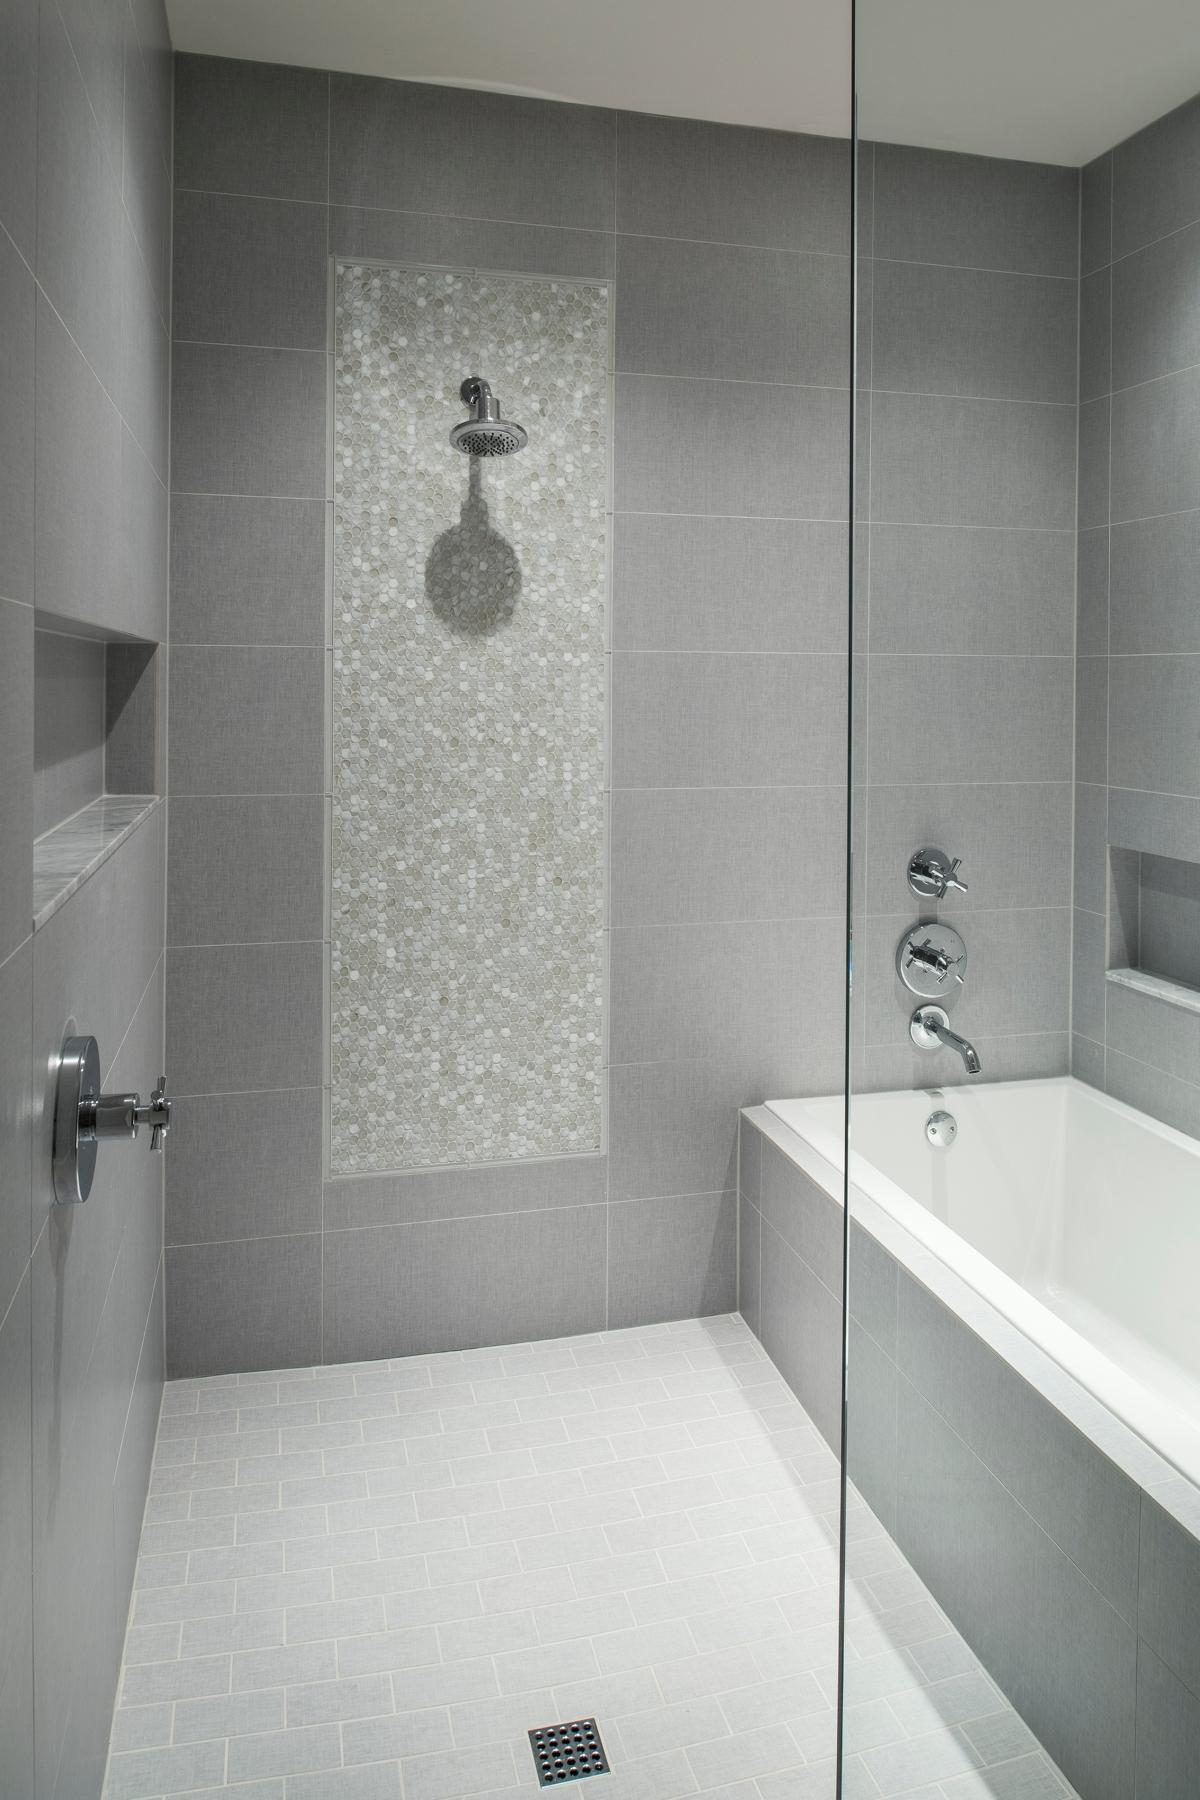 Urban Farmhouse shower by Brianna Michelle Design